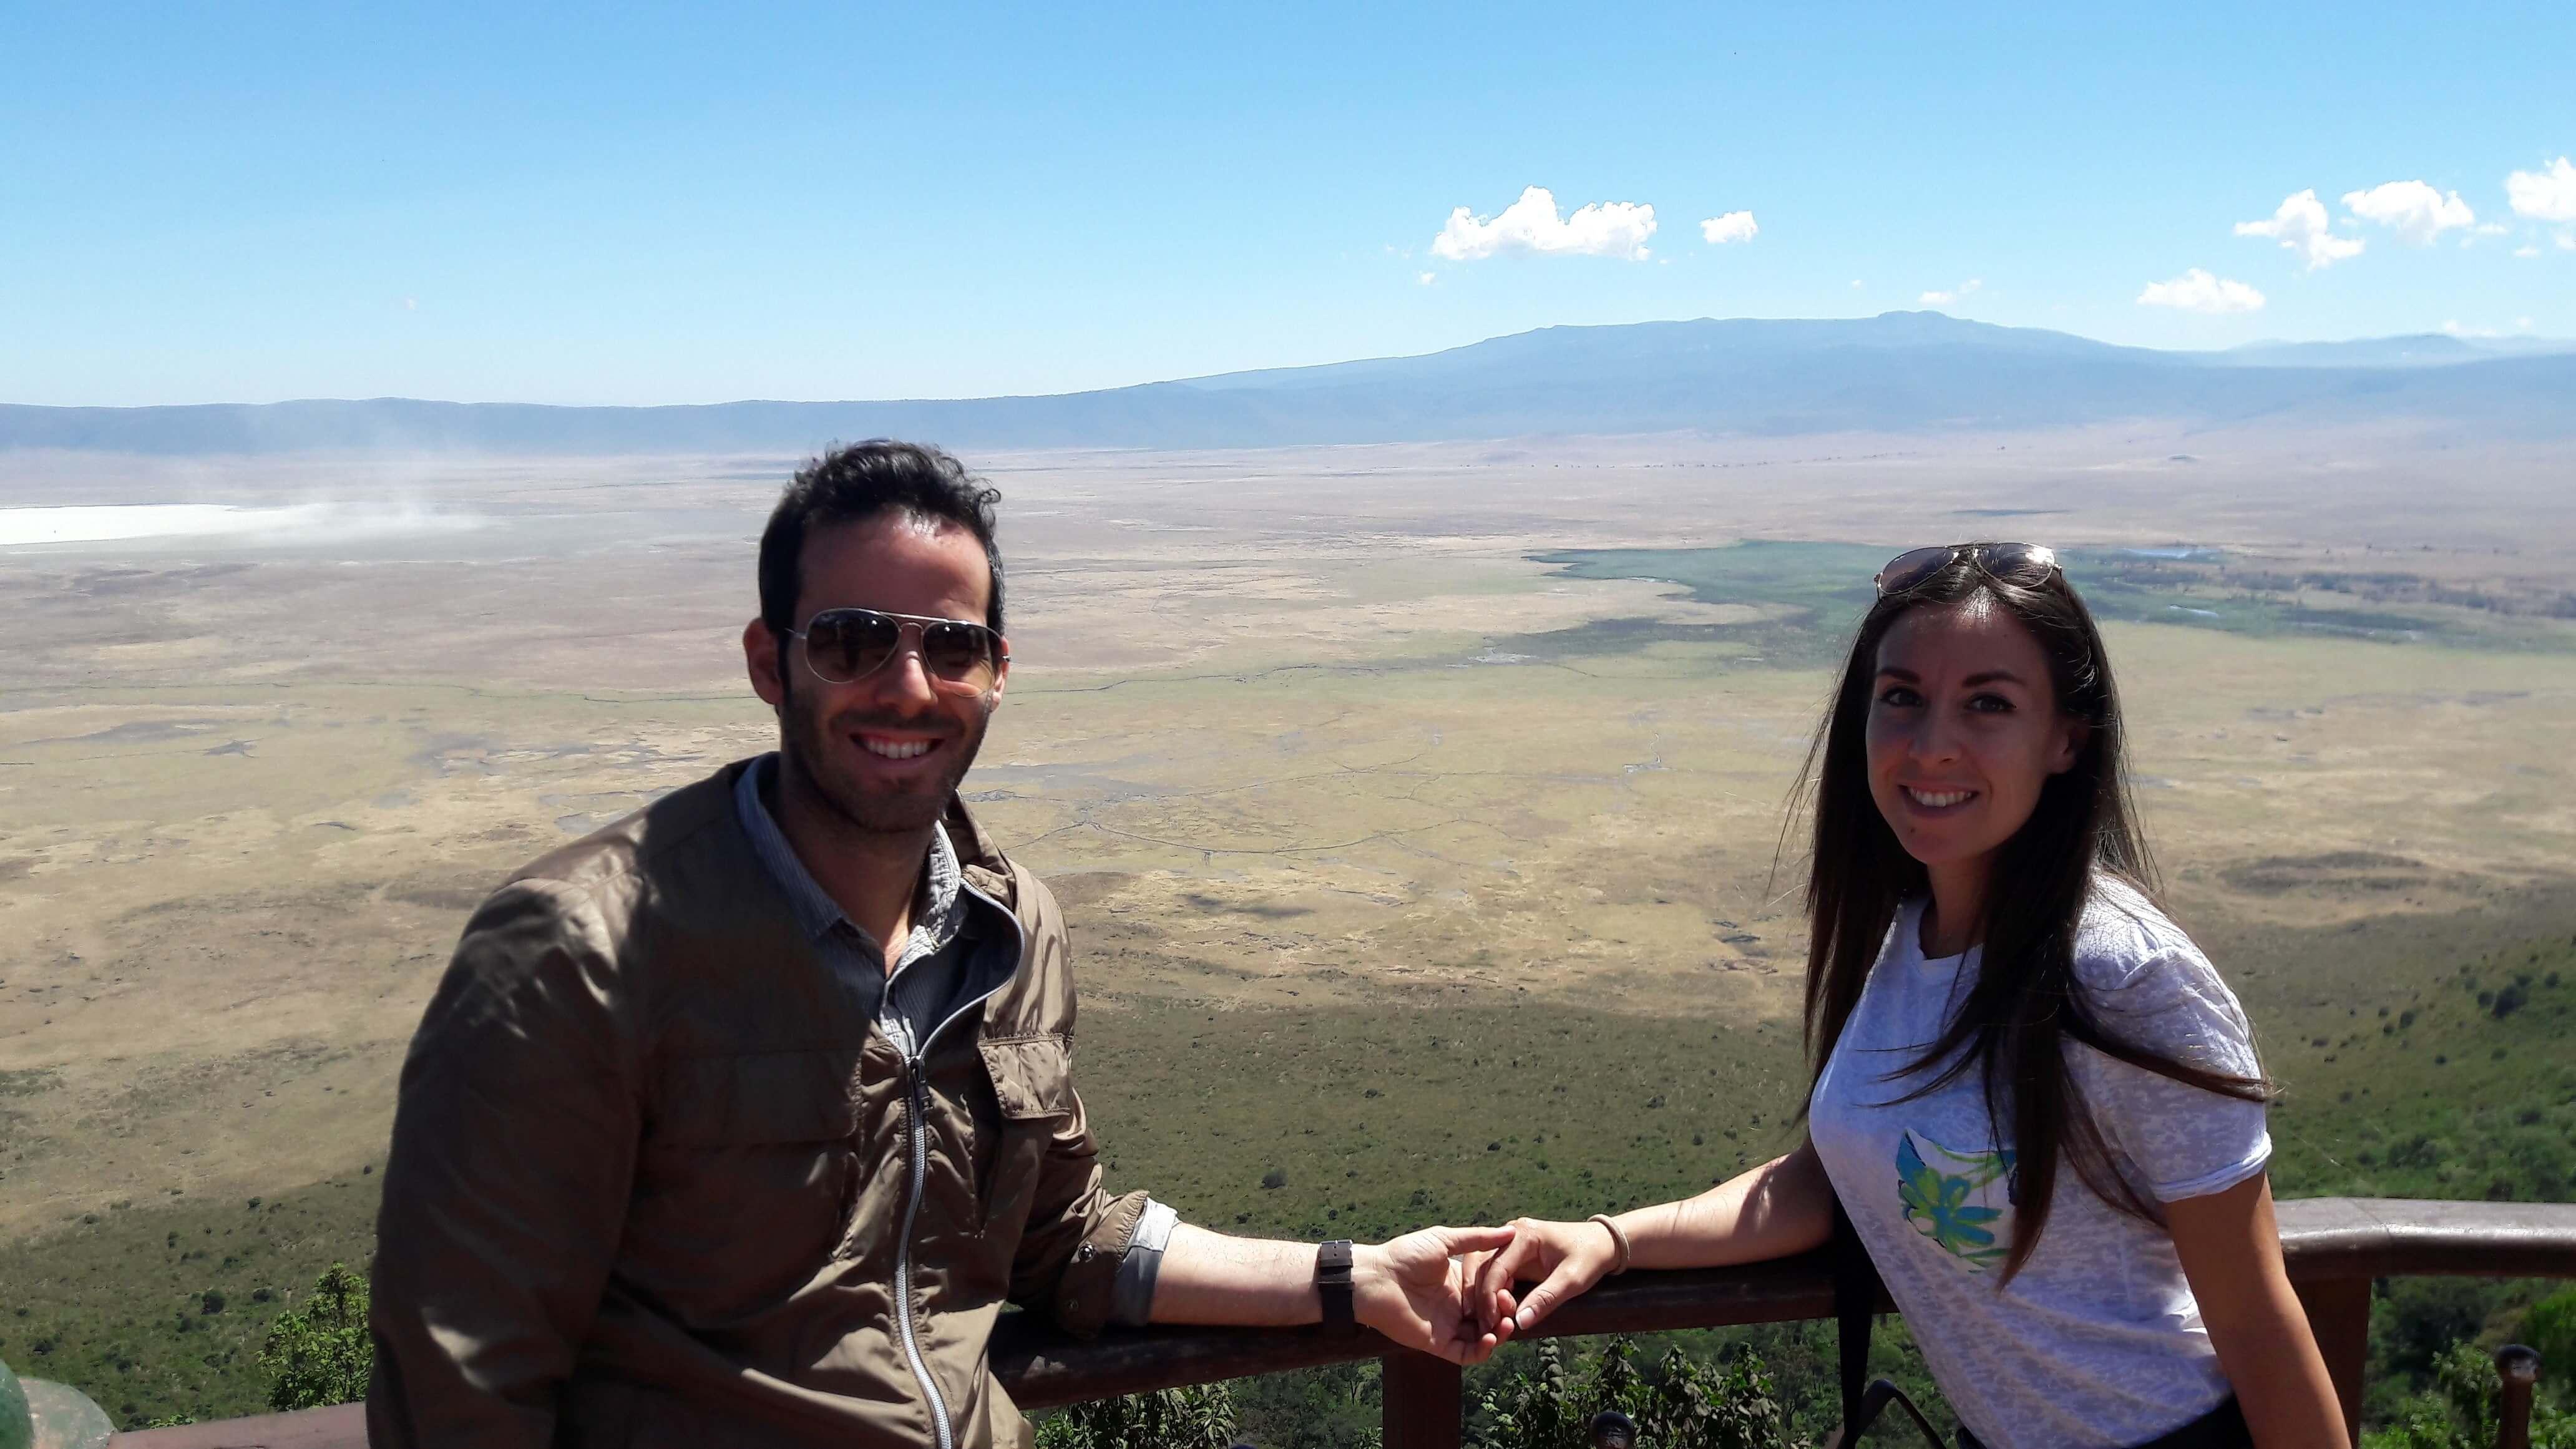 safari parco nazionale ngorongoro crater